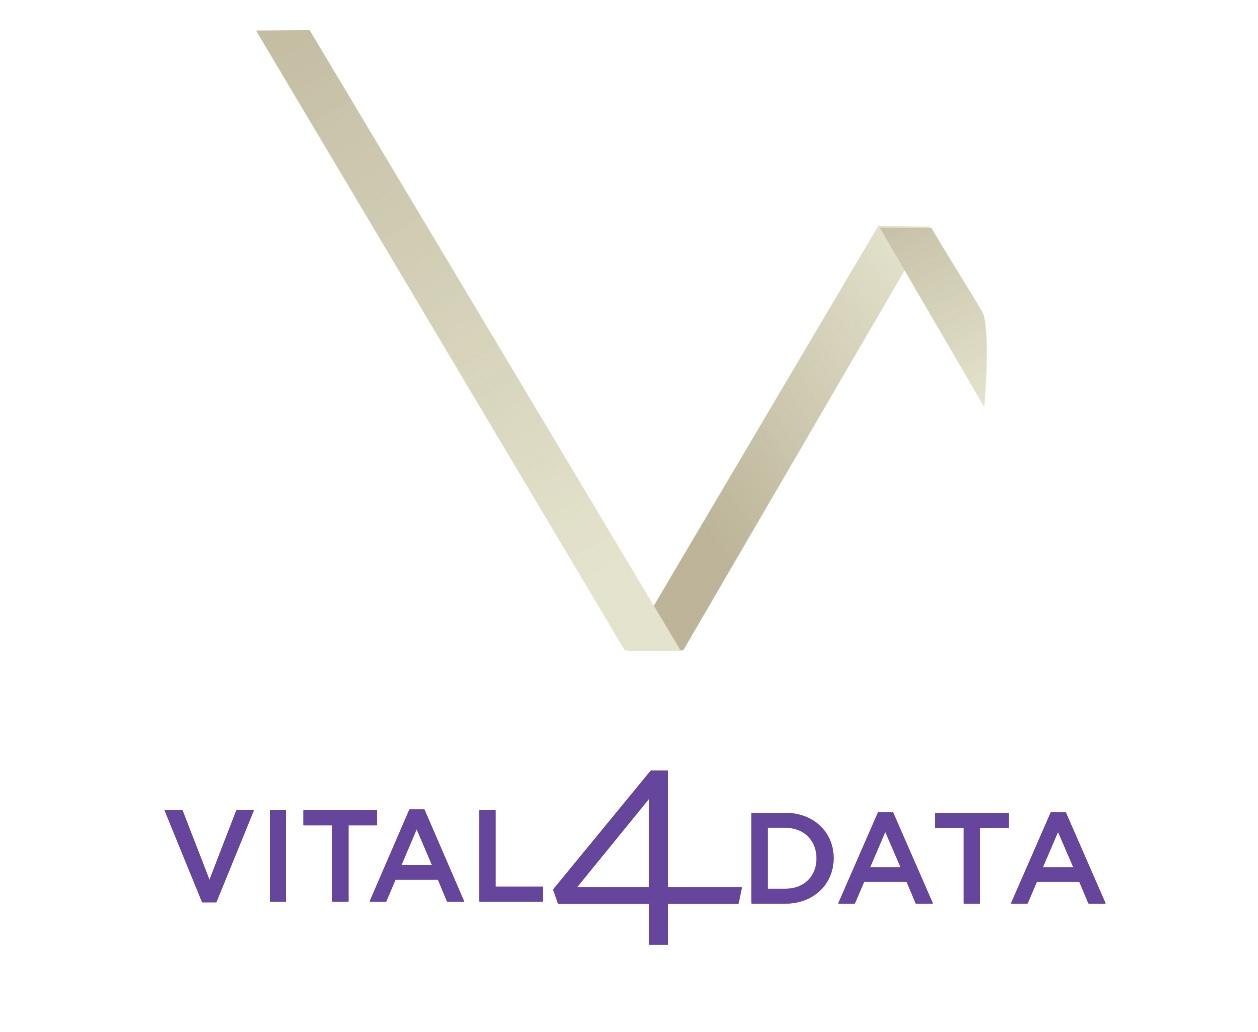 vital4data